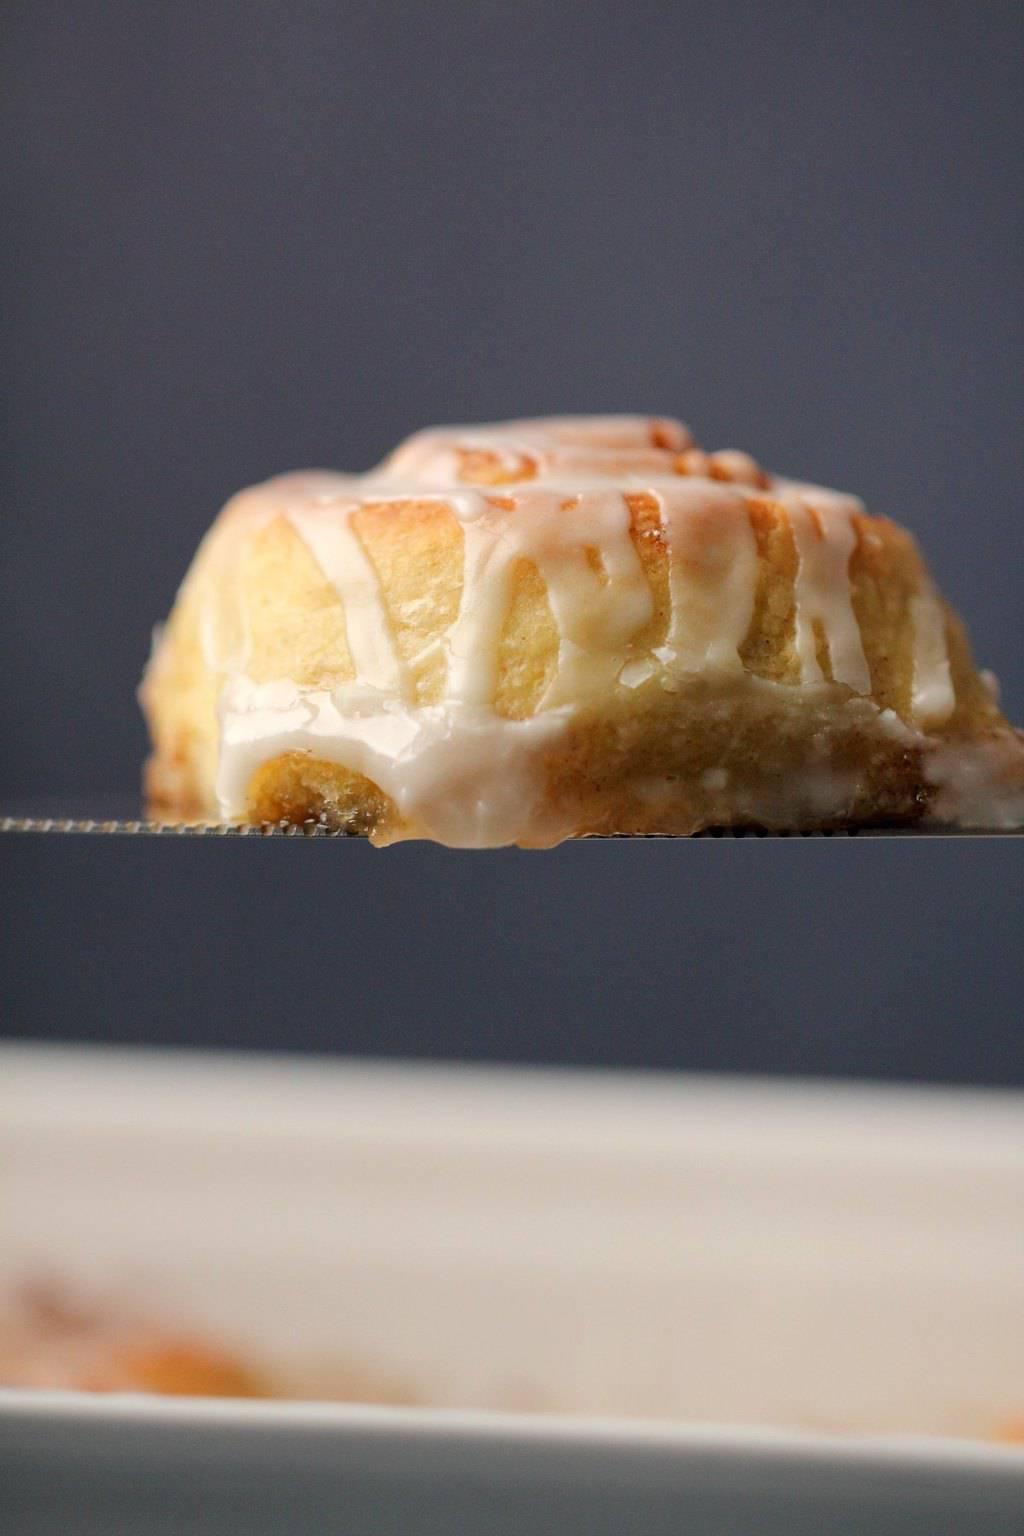 Vegan cinnamon roll on a silver cake lifter.